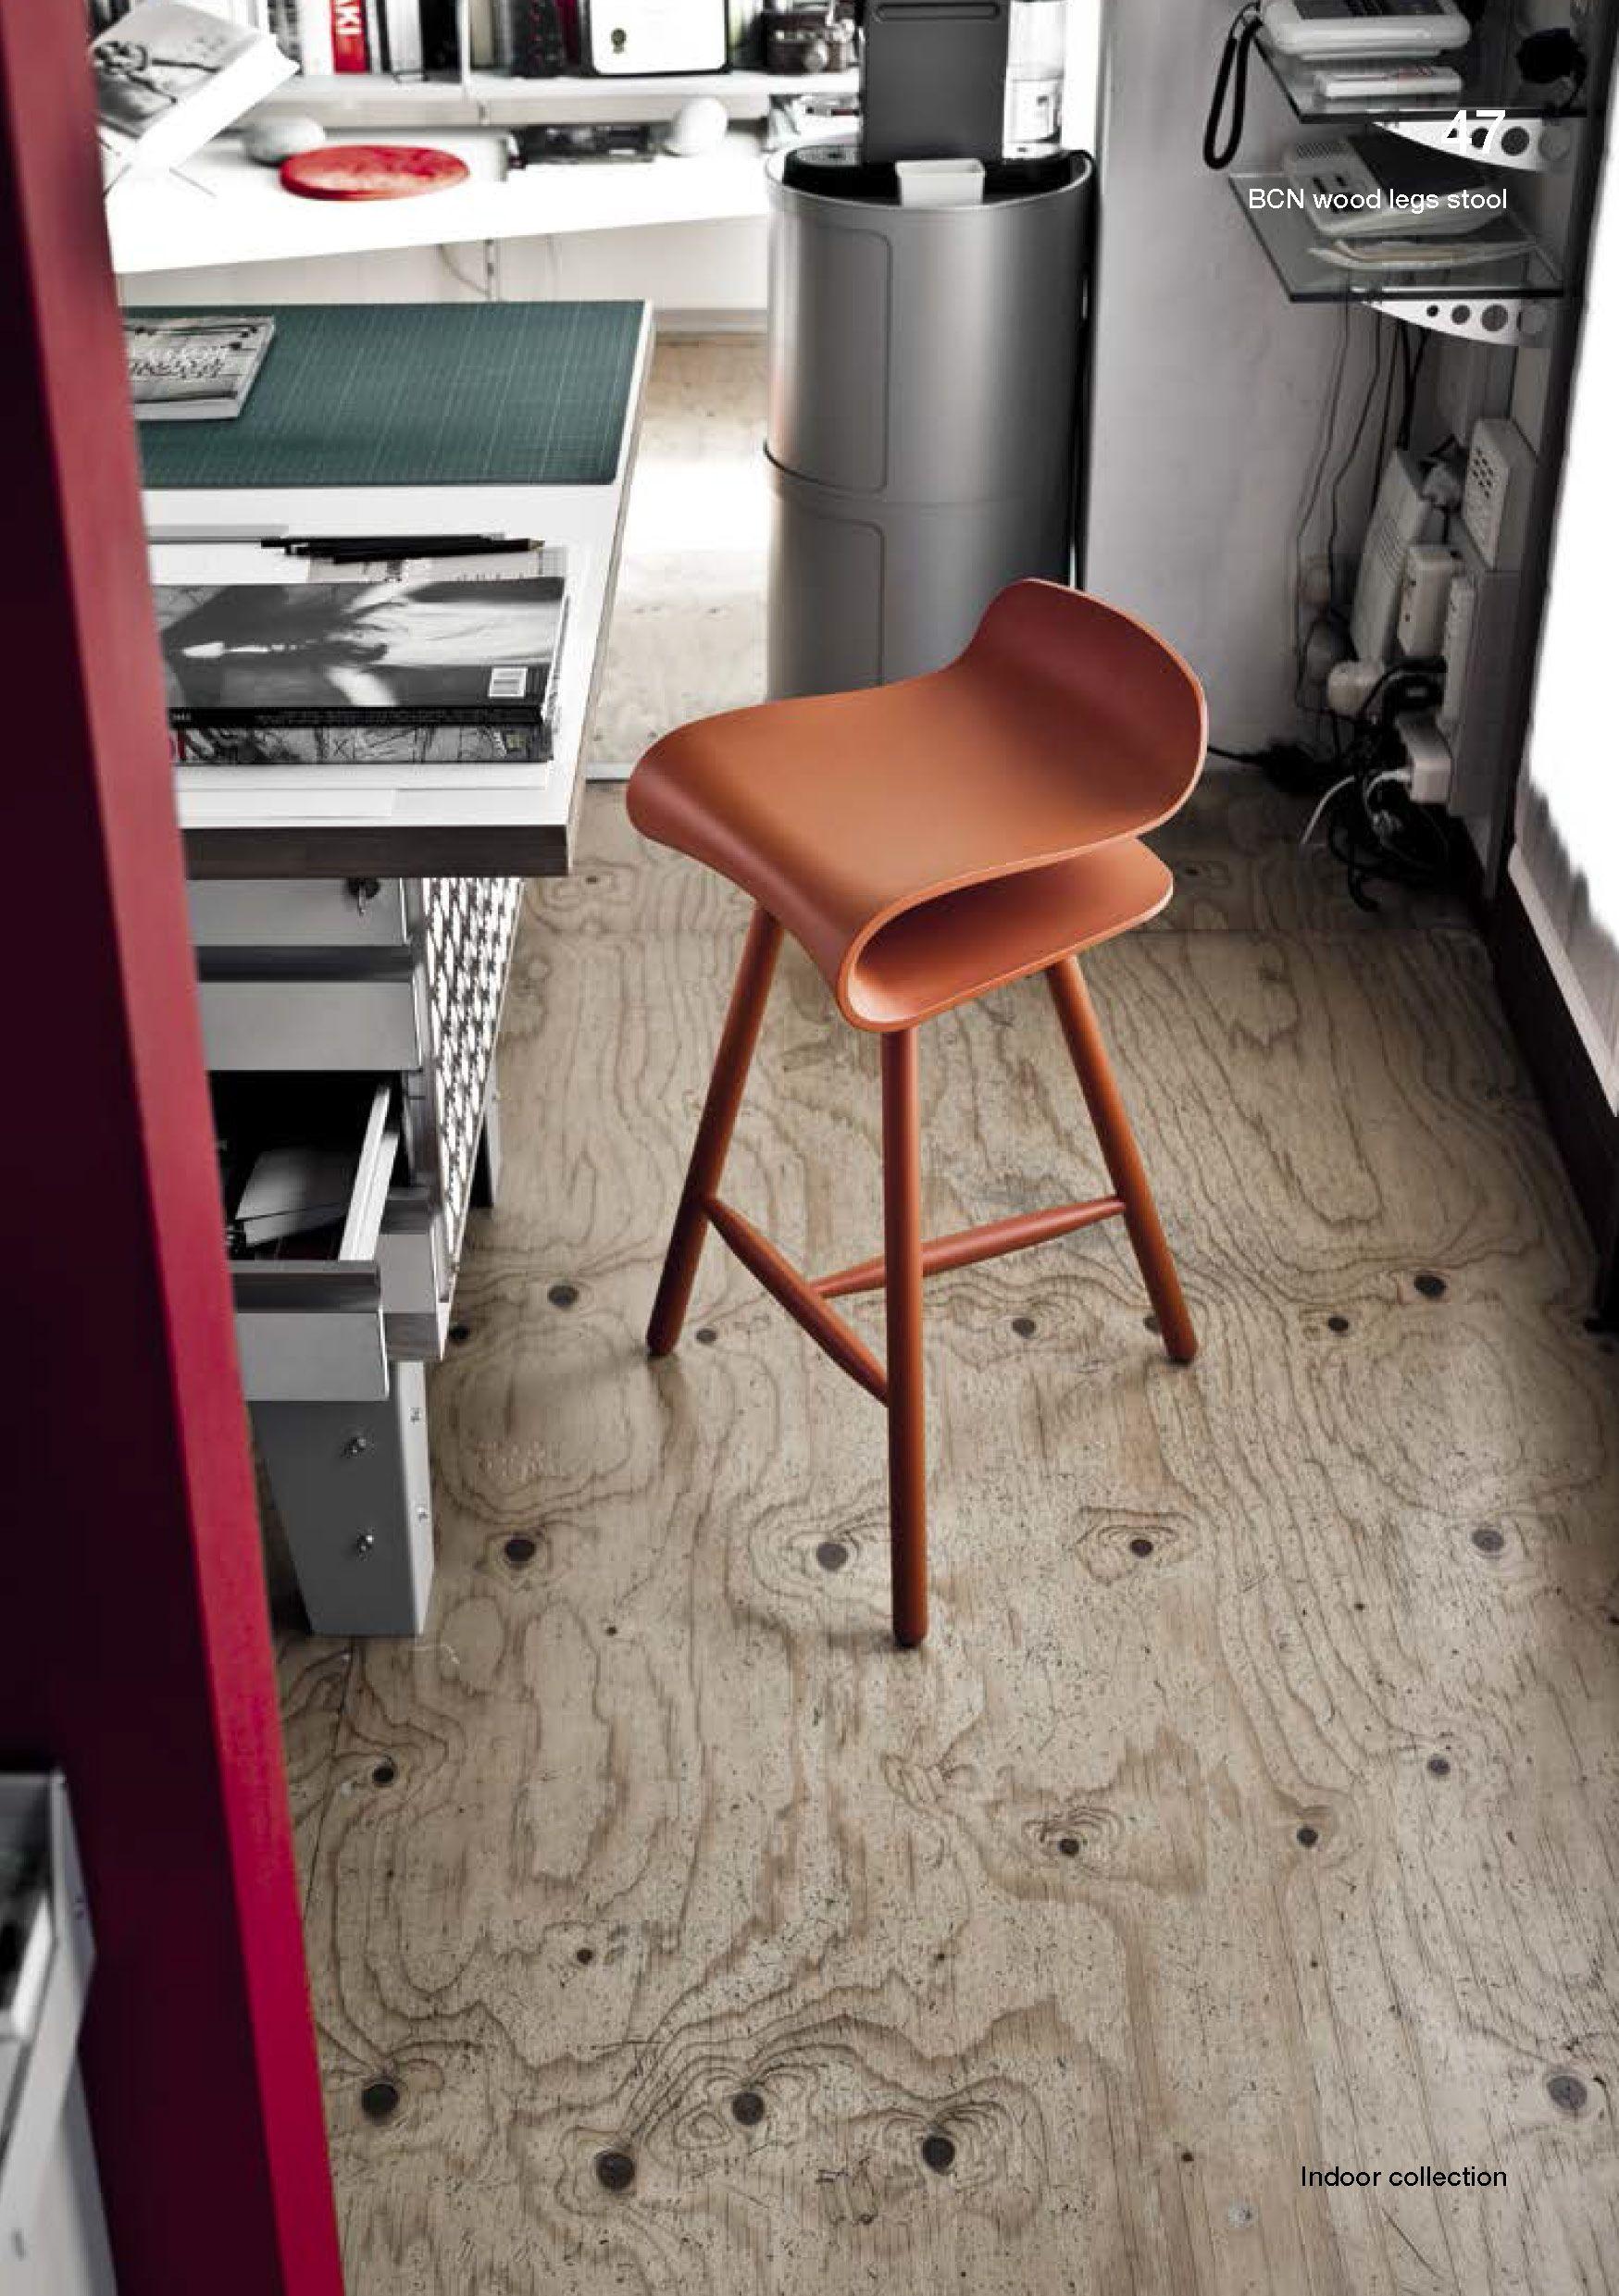 marie stella maris inspiration interior pinterest industrial interiors and stools. Black Bedroom Furniture Sets. Home Design Ideas